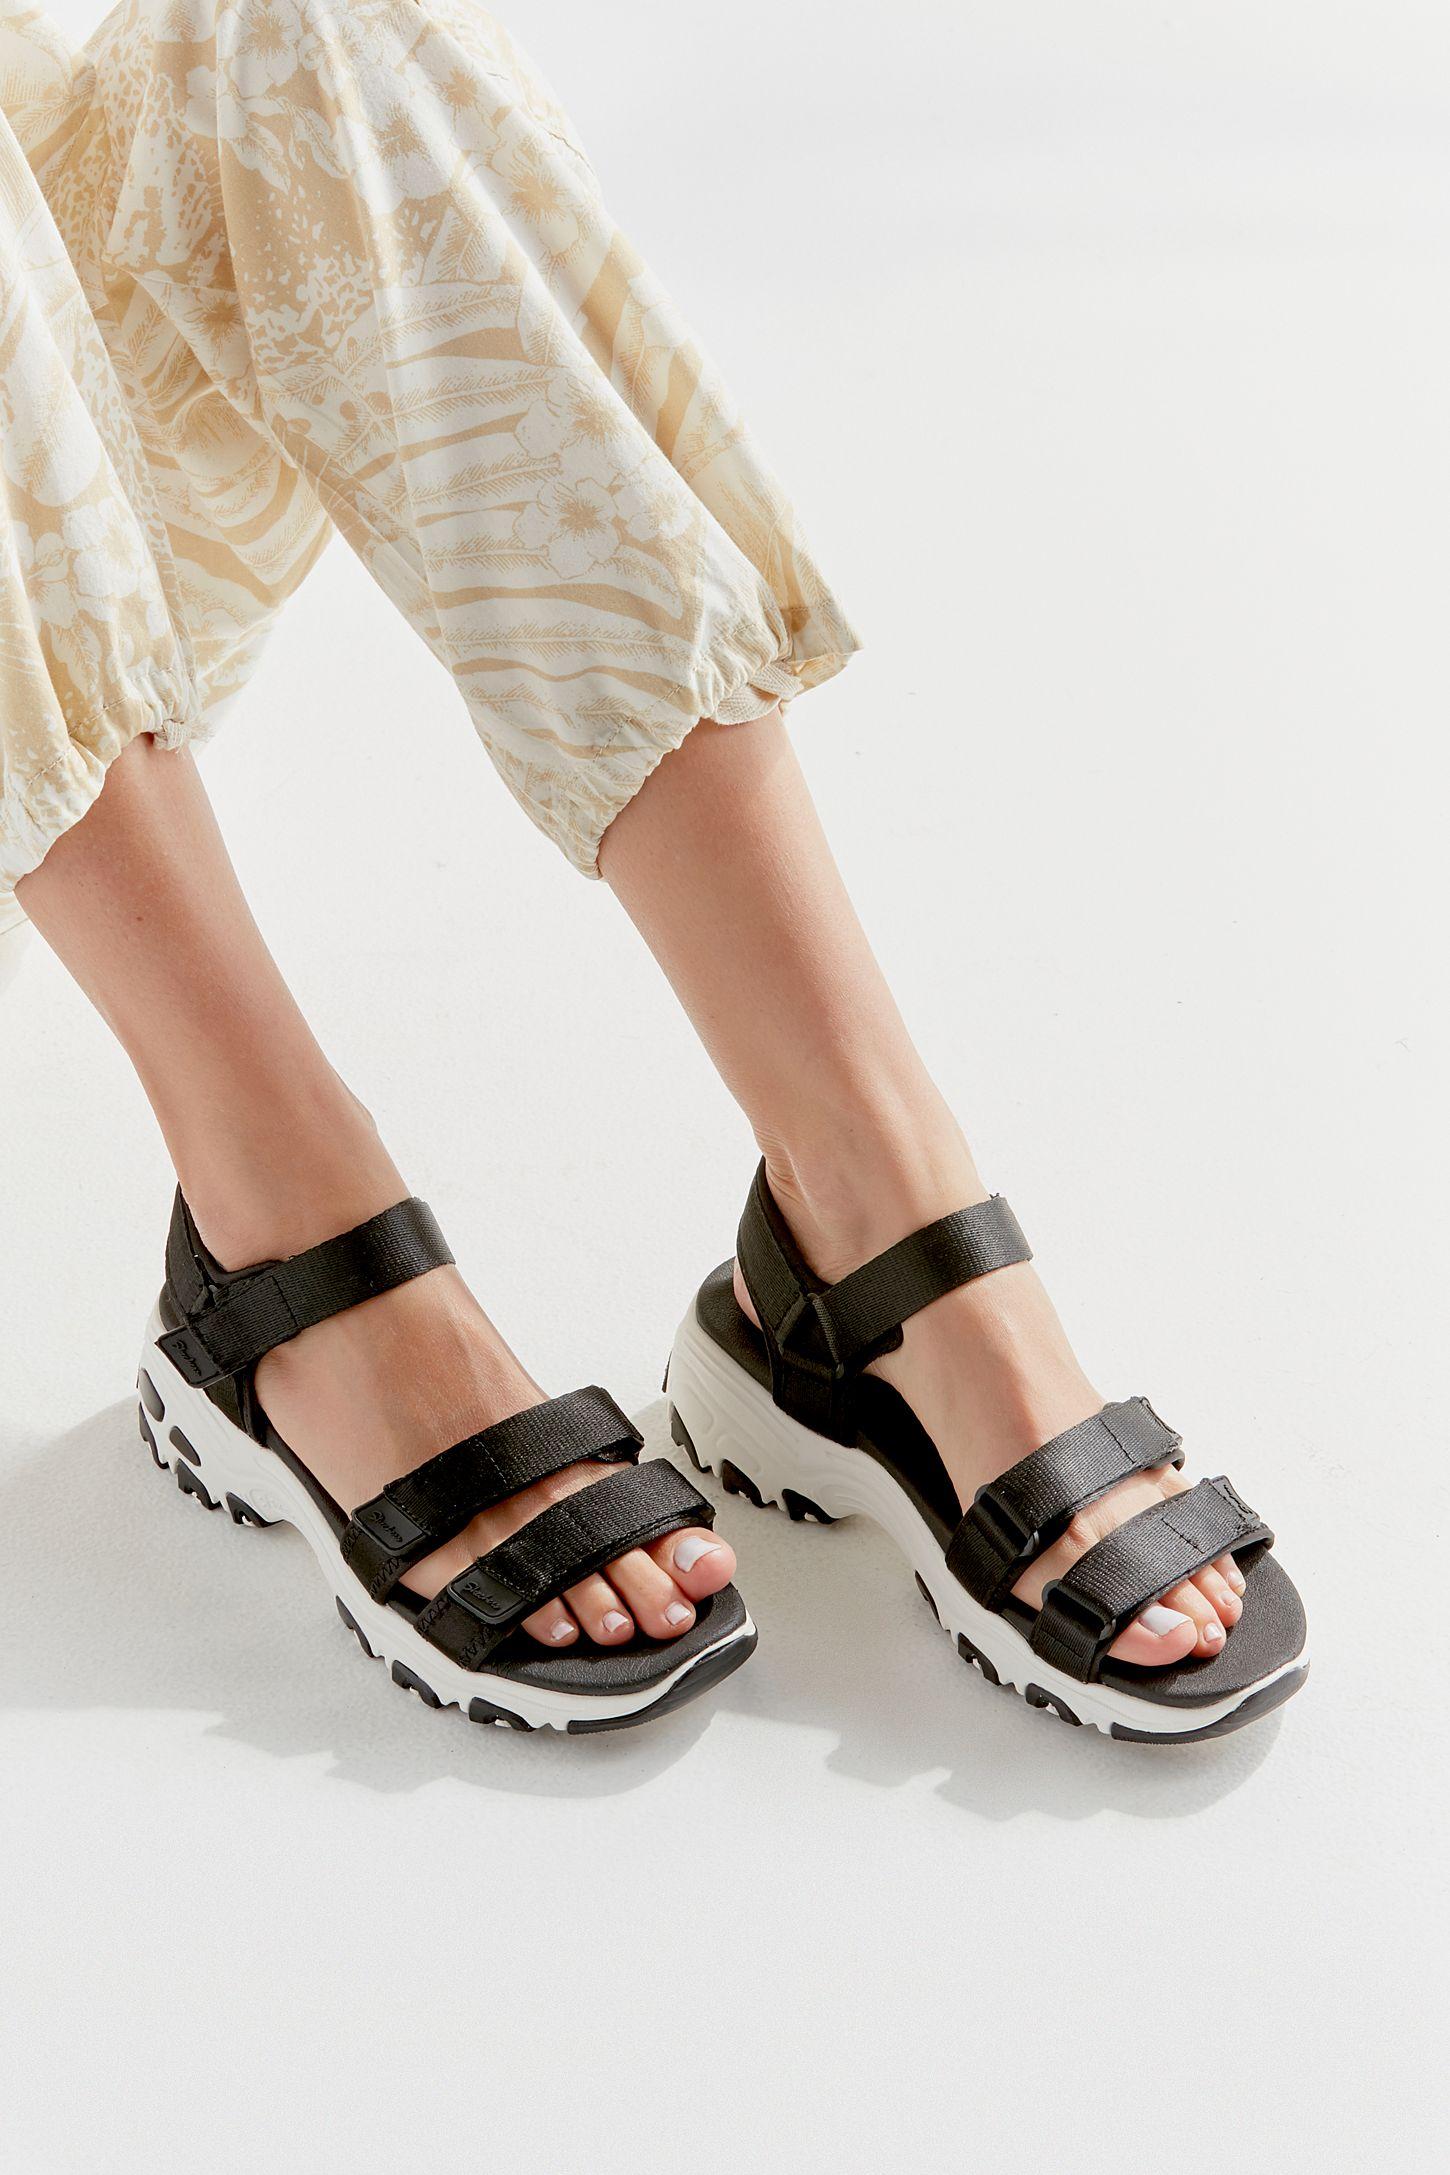 Skechers D'Lites Fresh Catch Sandal | Accessorize in 2019